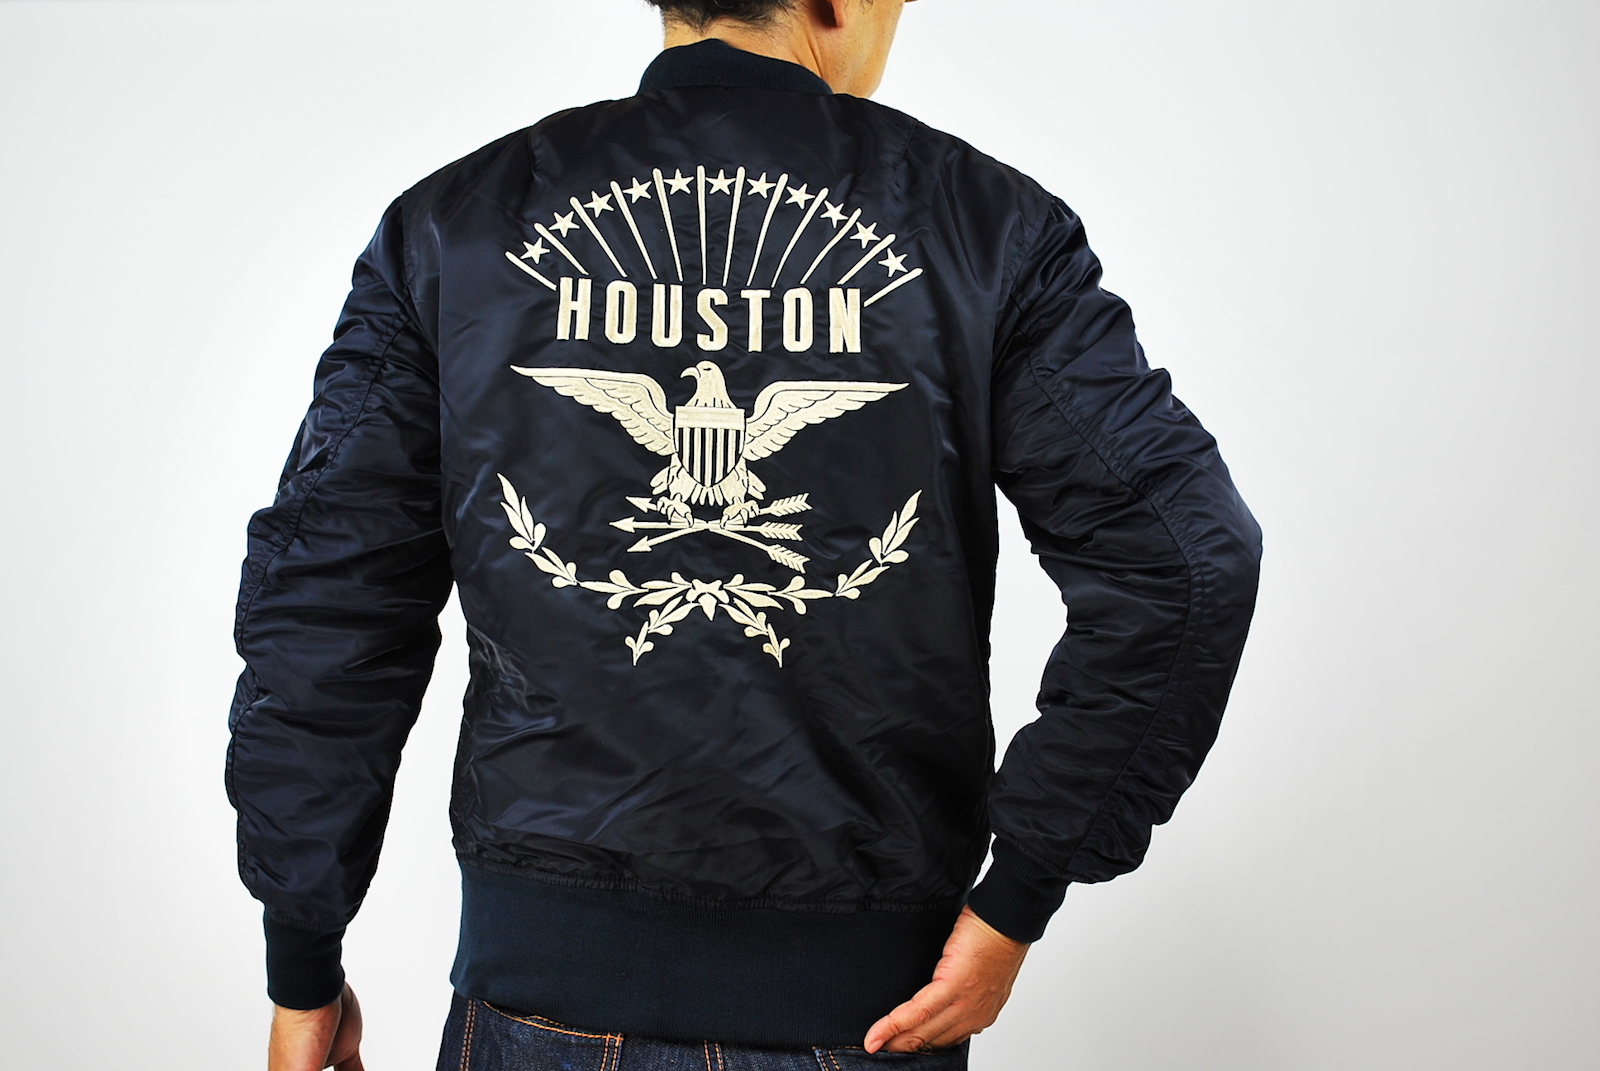 HOUSTON MA-1 刺繍ロゴ FLIGHT JACKET ミリタリー フライトジャケット 50565 NAVY ネイビー L houston ma-1 ミリタリー ジャケット コート